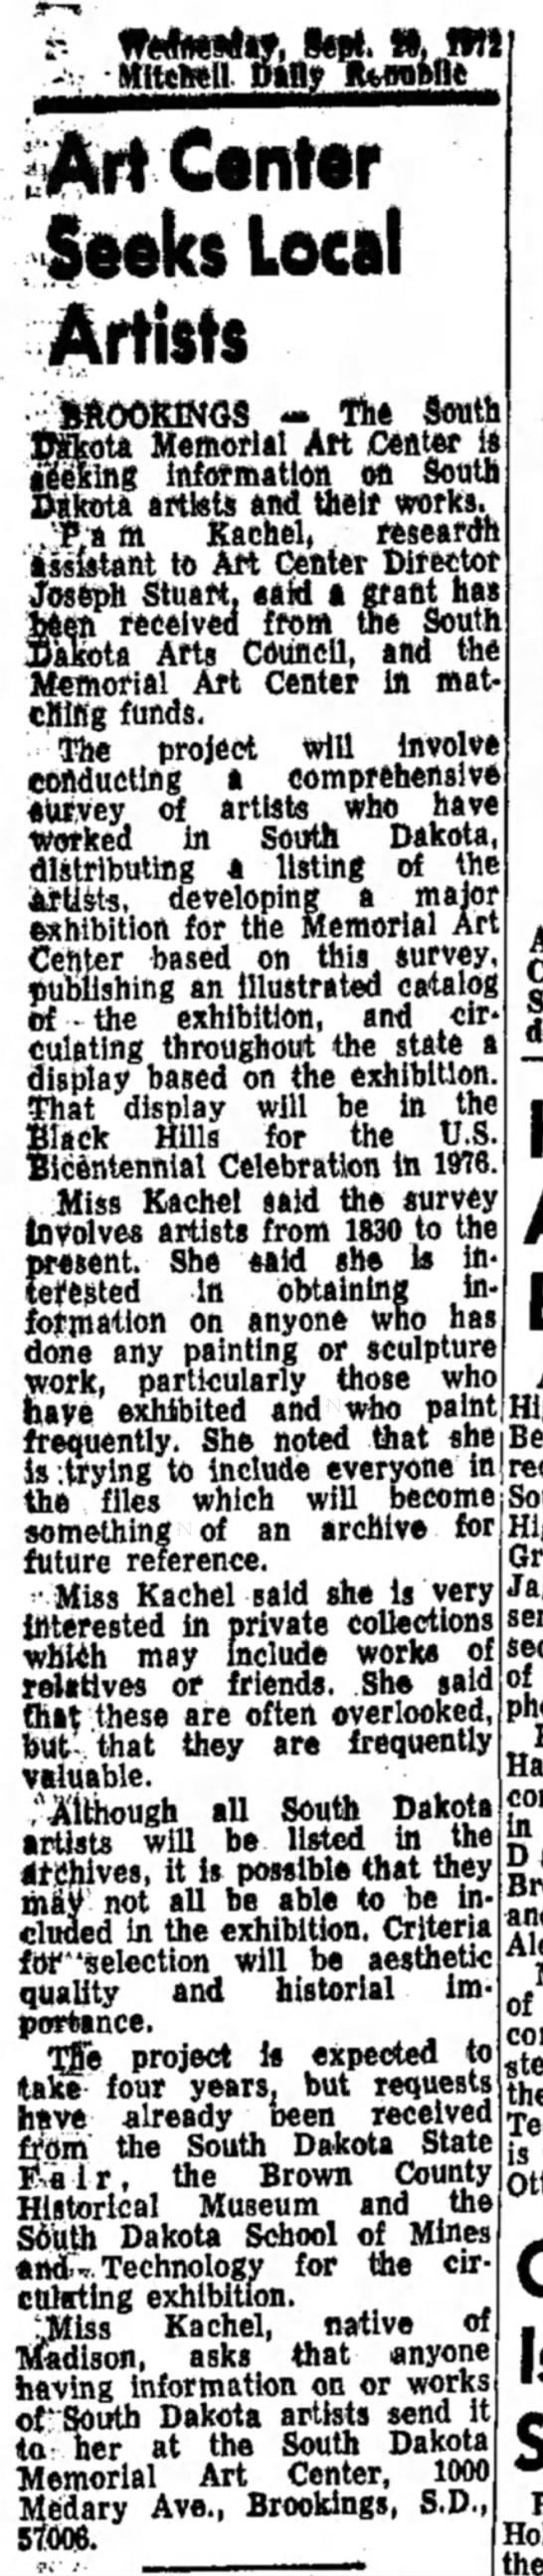 Art Center seeks local artists, The Daily Republic, 20 Spt 1972 -